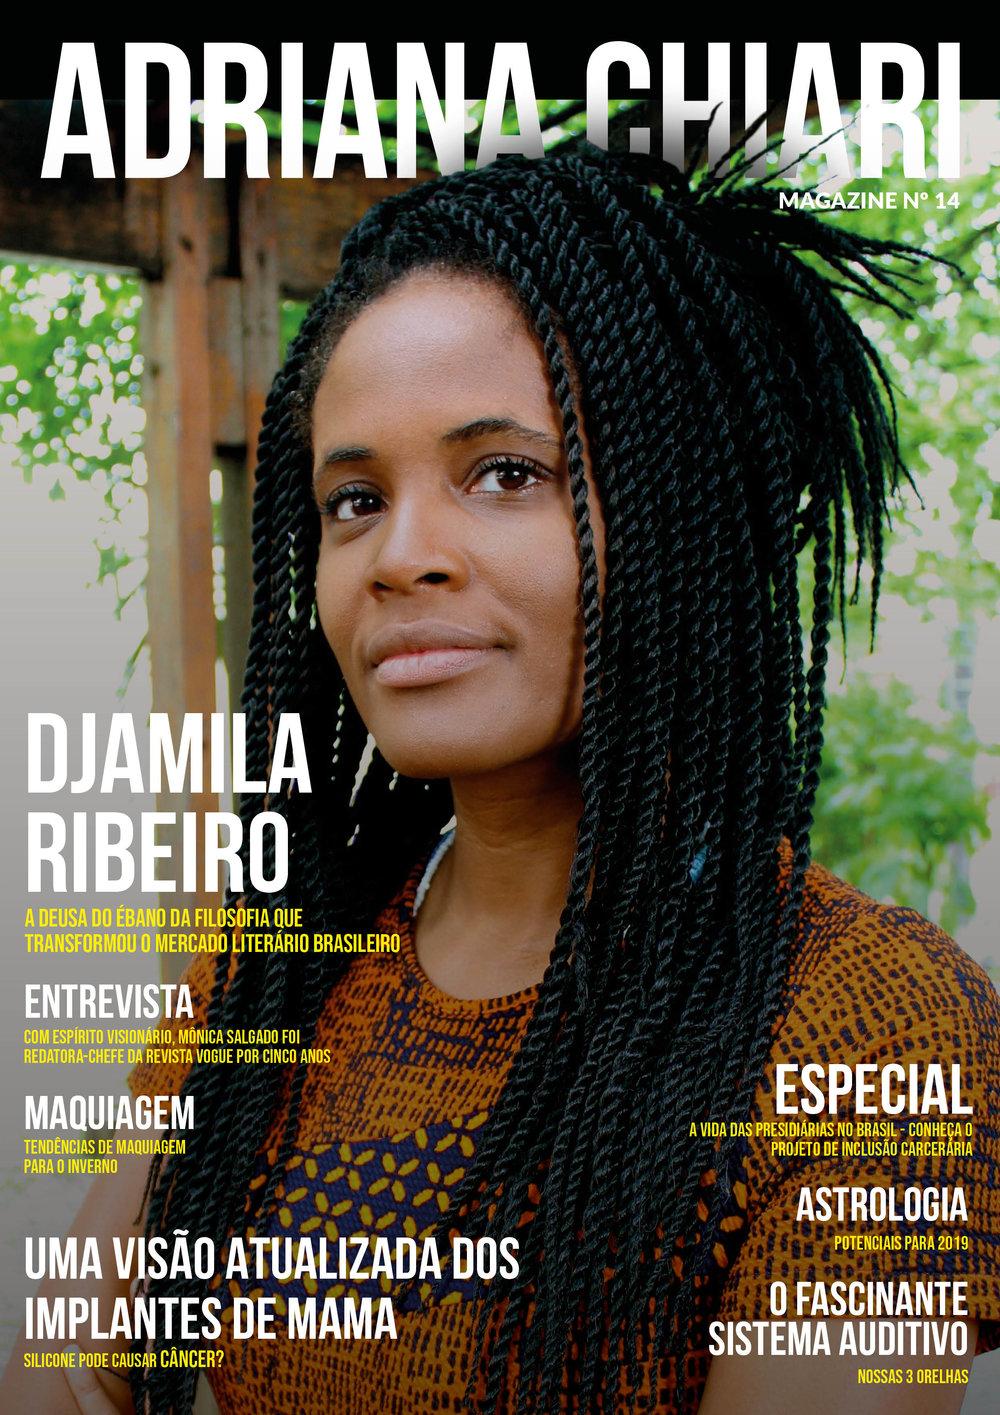 14ª Edição Adriana Chiari Magazine - Dezembro - 2018